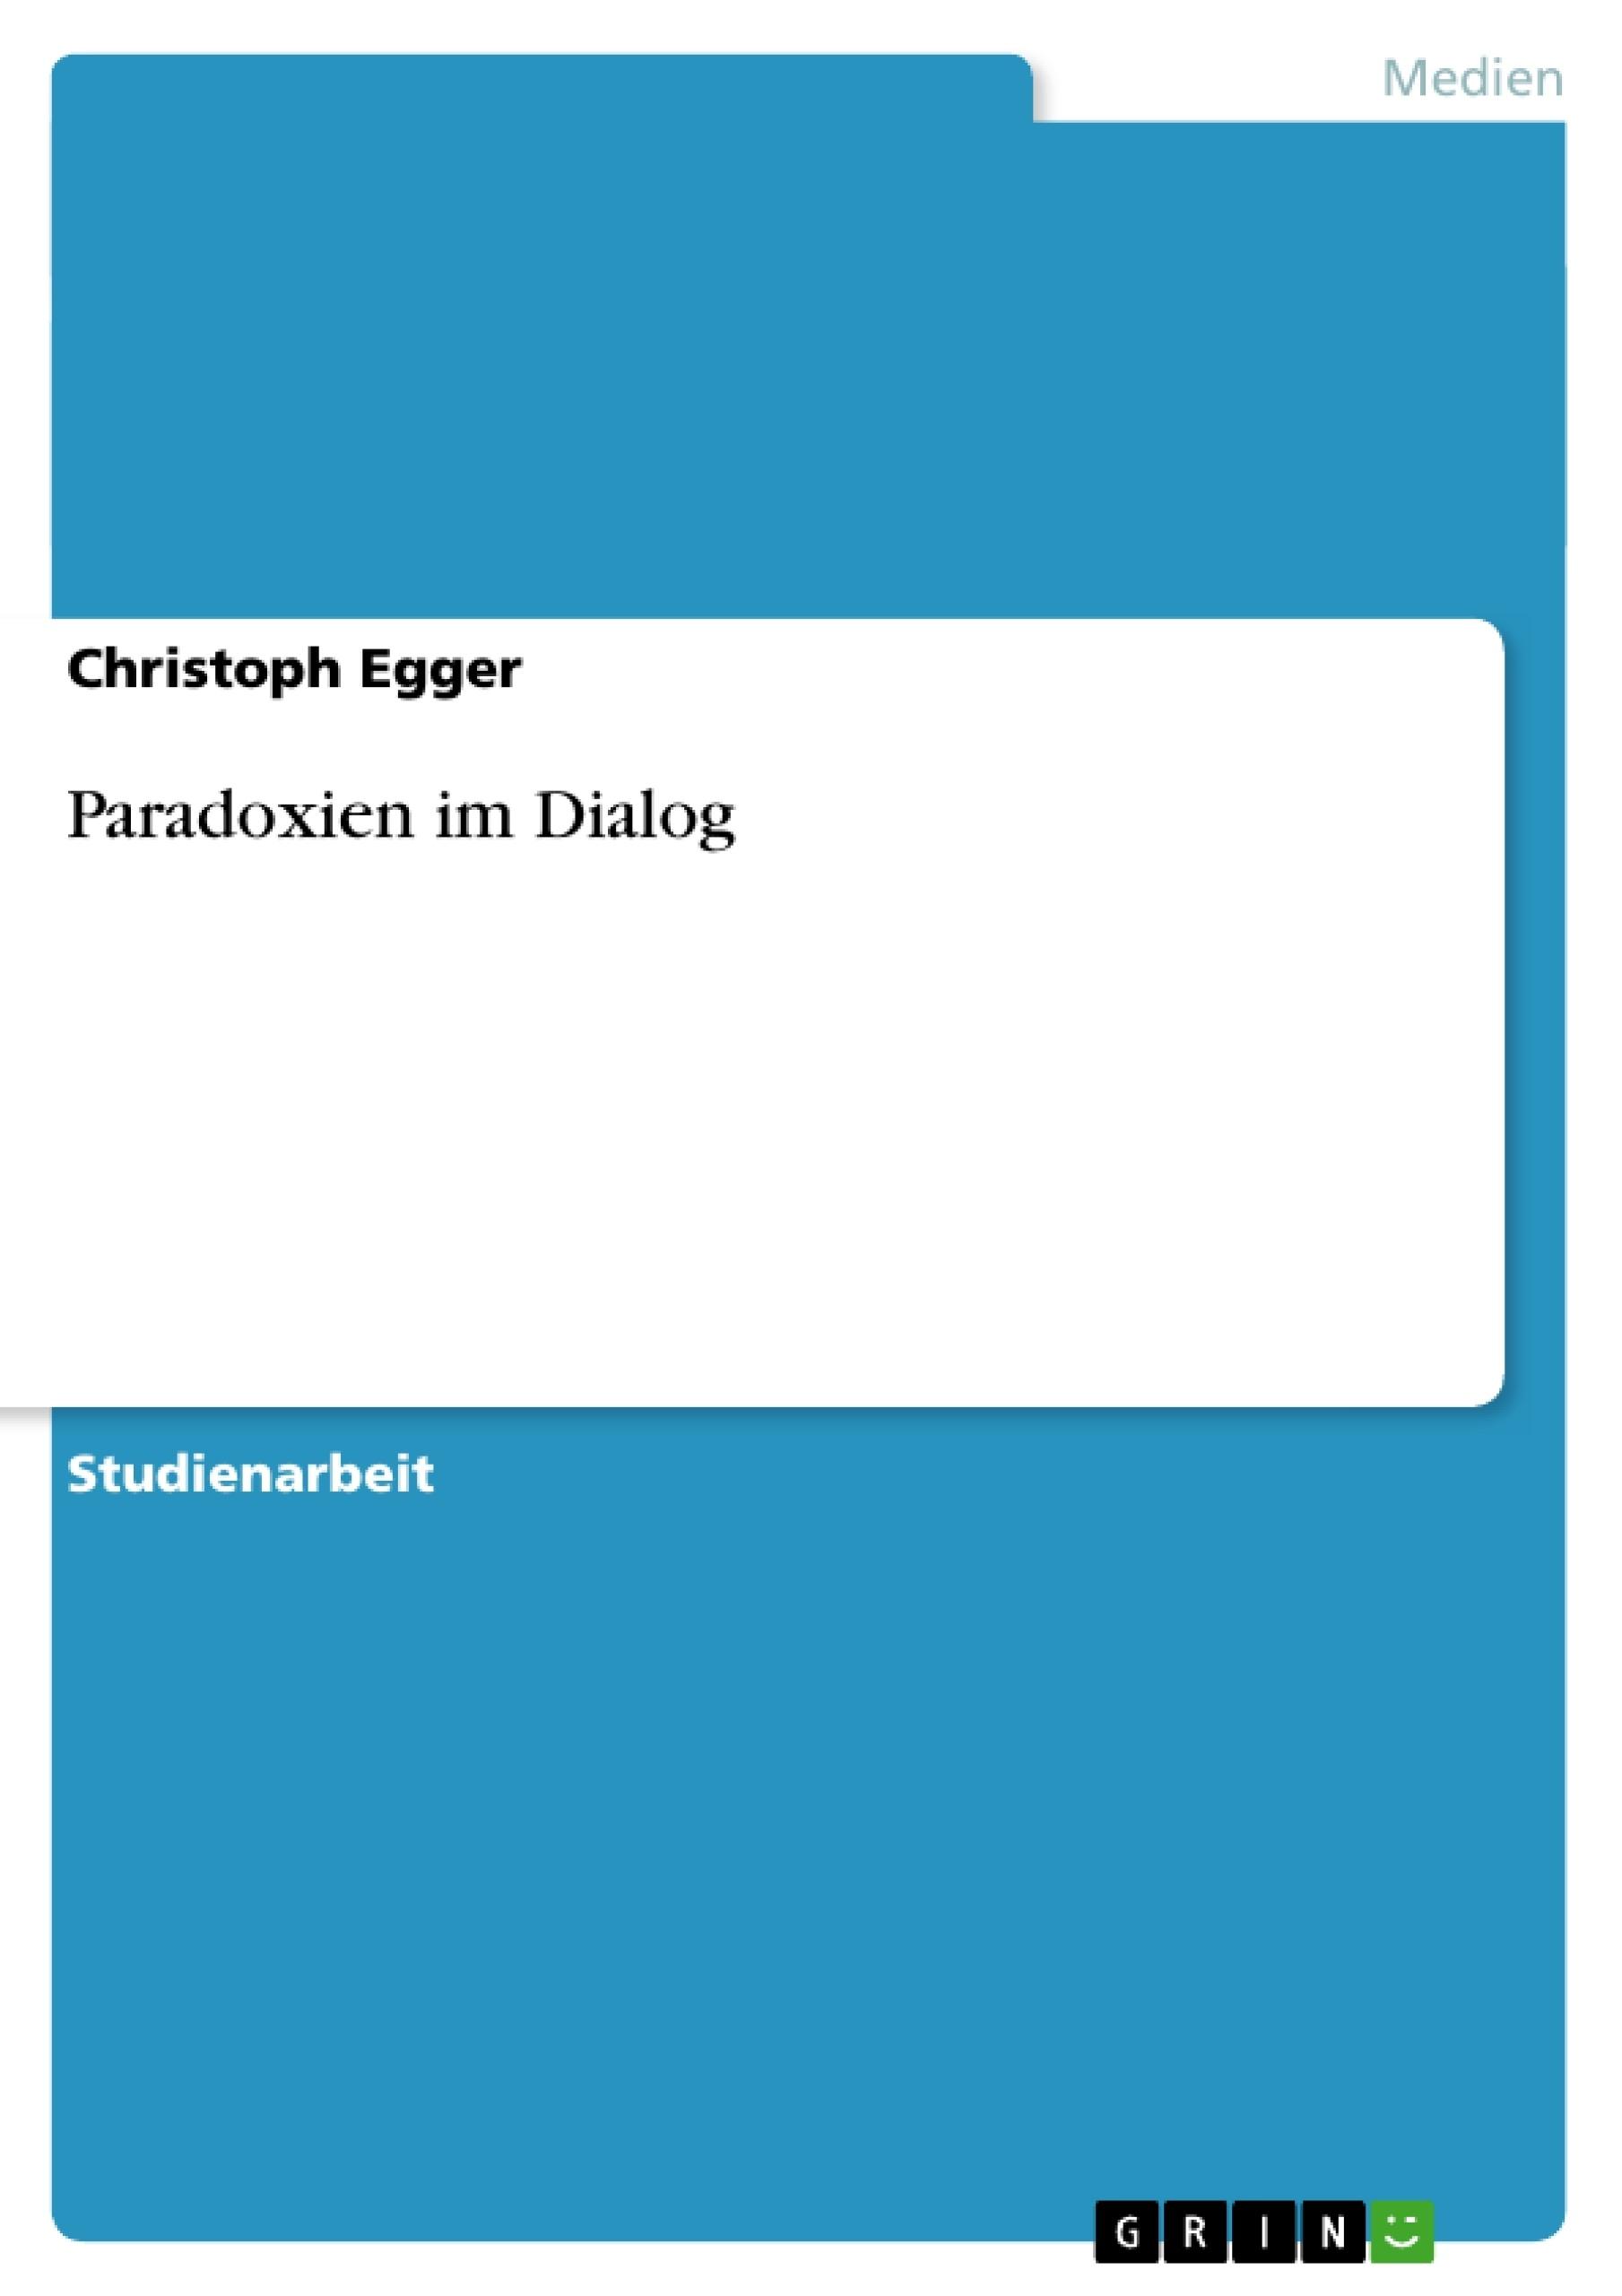 Titel: Paradoxien im Dialog